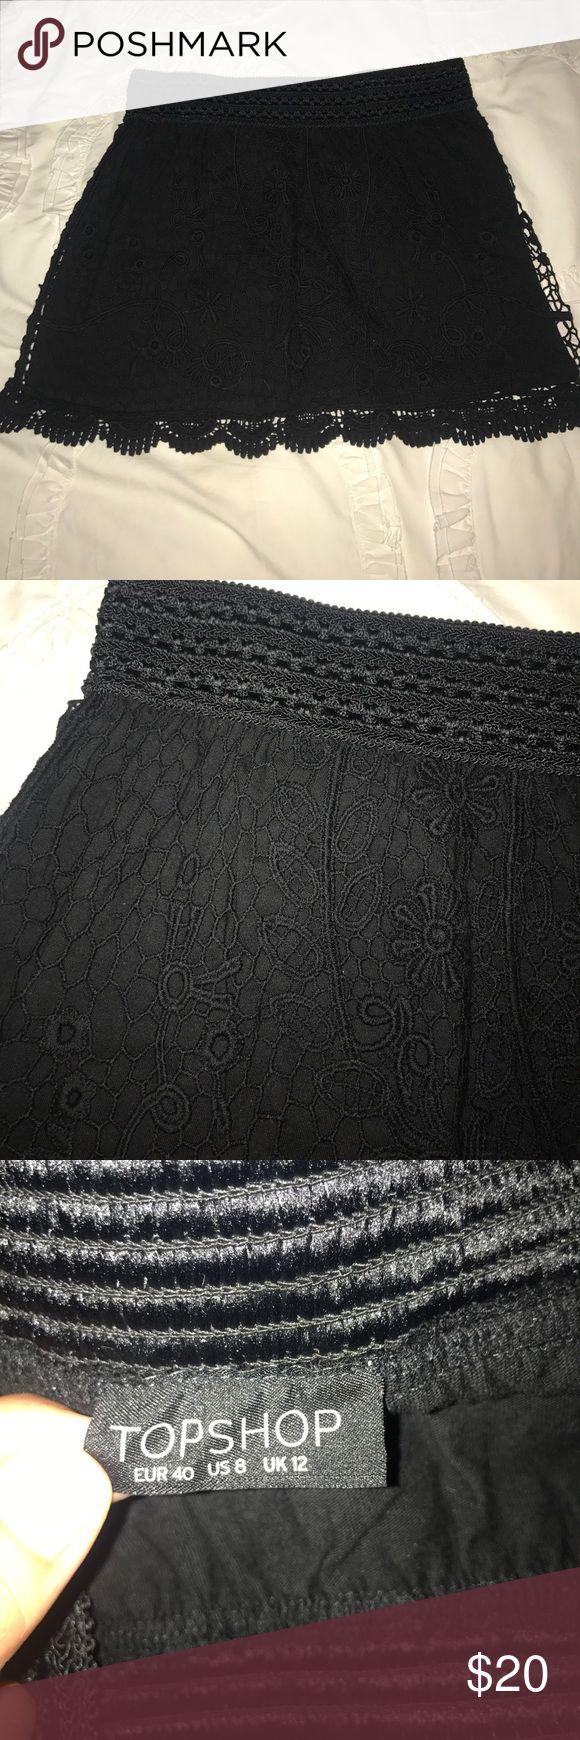 Black Crochet Topshop Skirt! Black crochet mini skirt from Topshop! Never worn, excellent condition! Topshop Skirts Mini